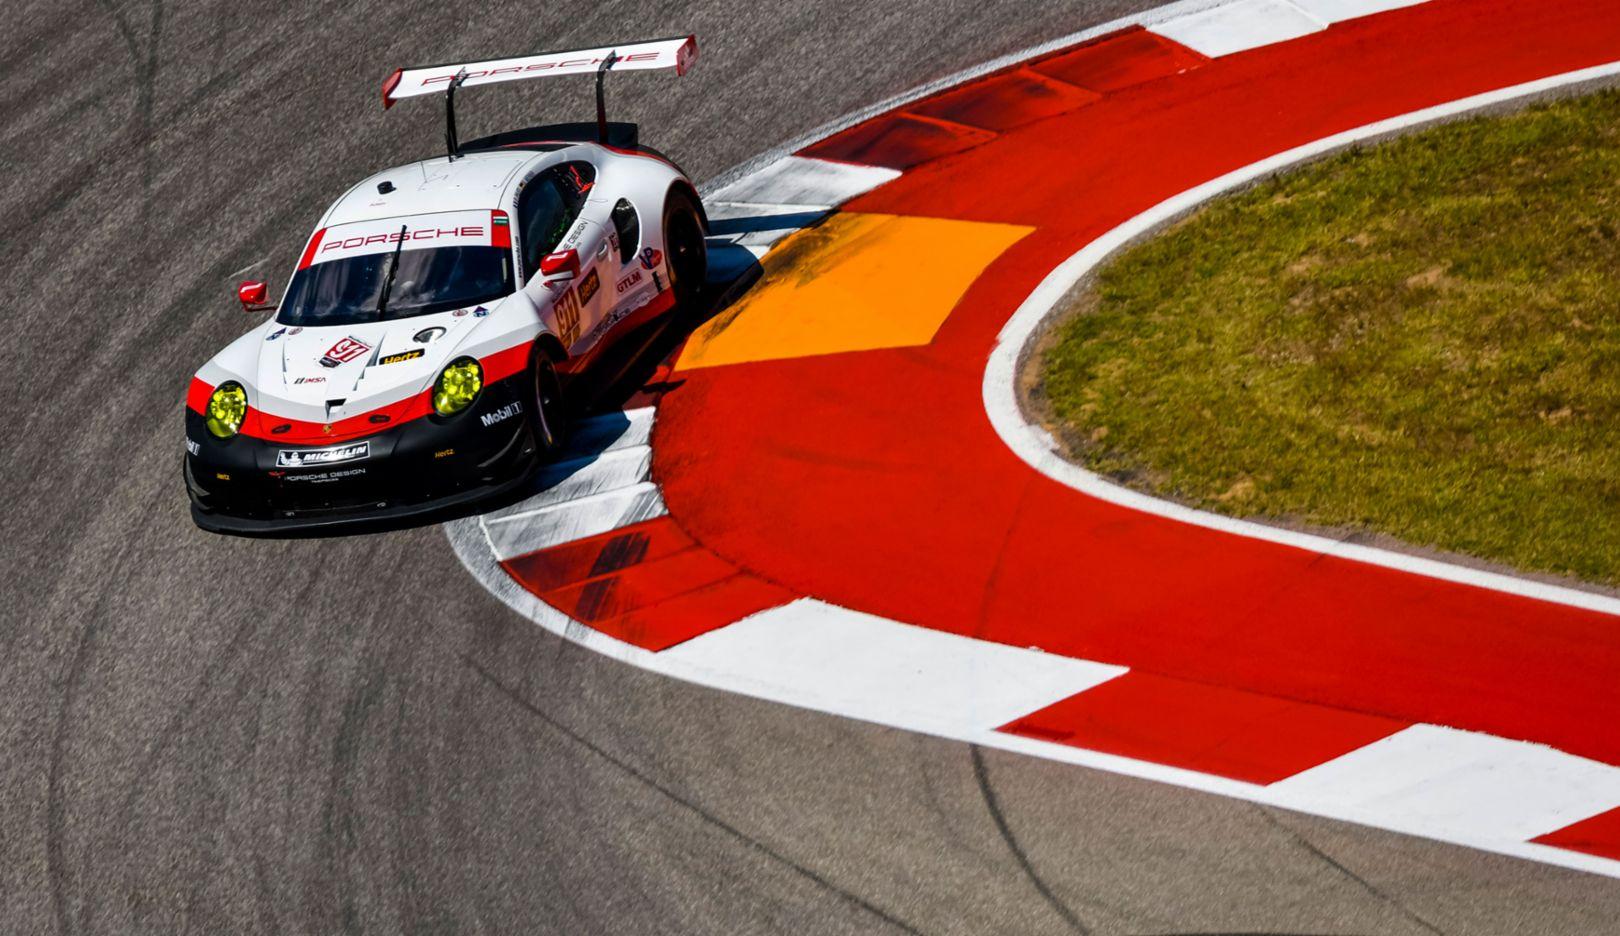 911 RSR, IMSA, Qualifying, Austin, Texas, 2017, Porsche AG